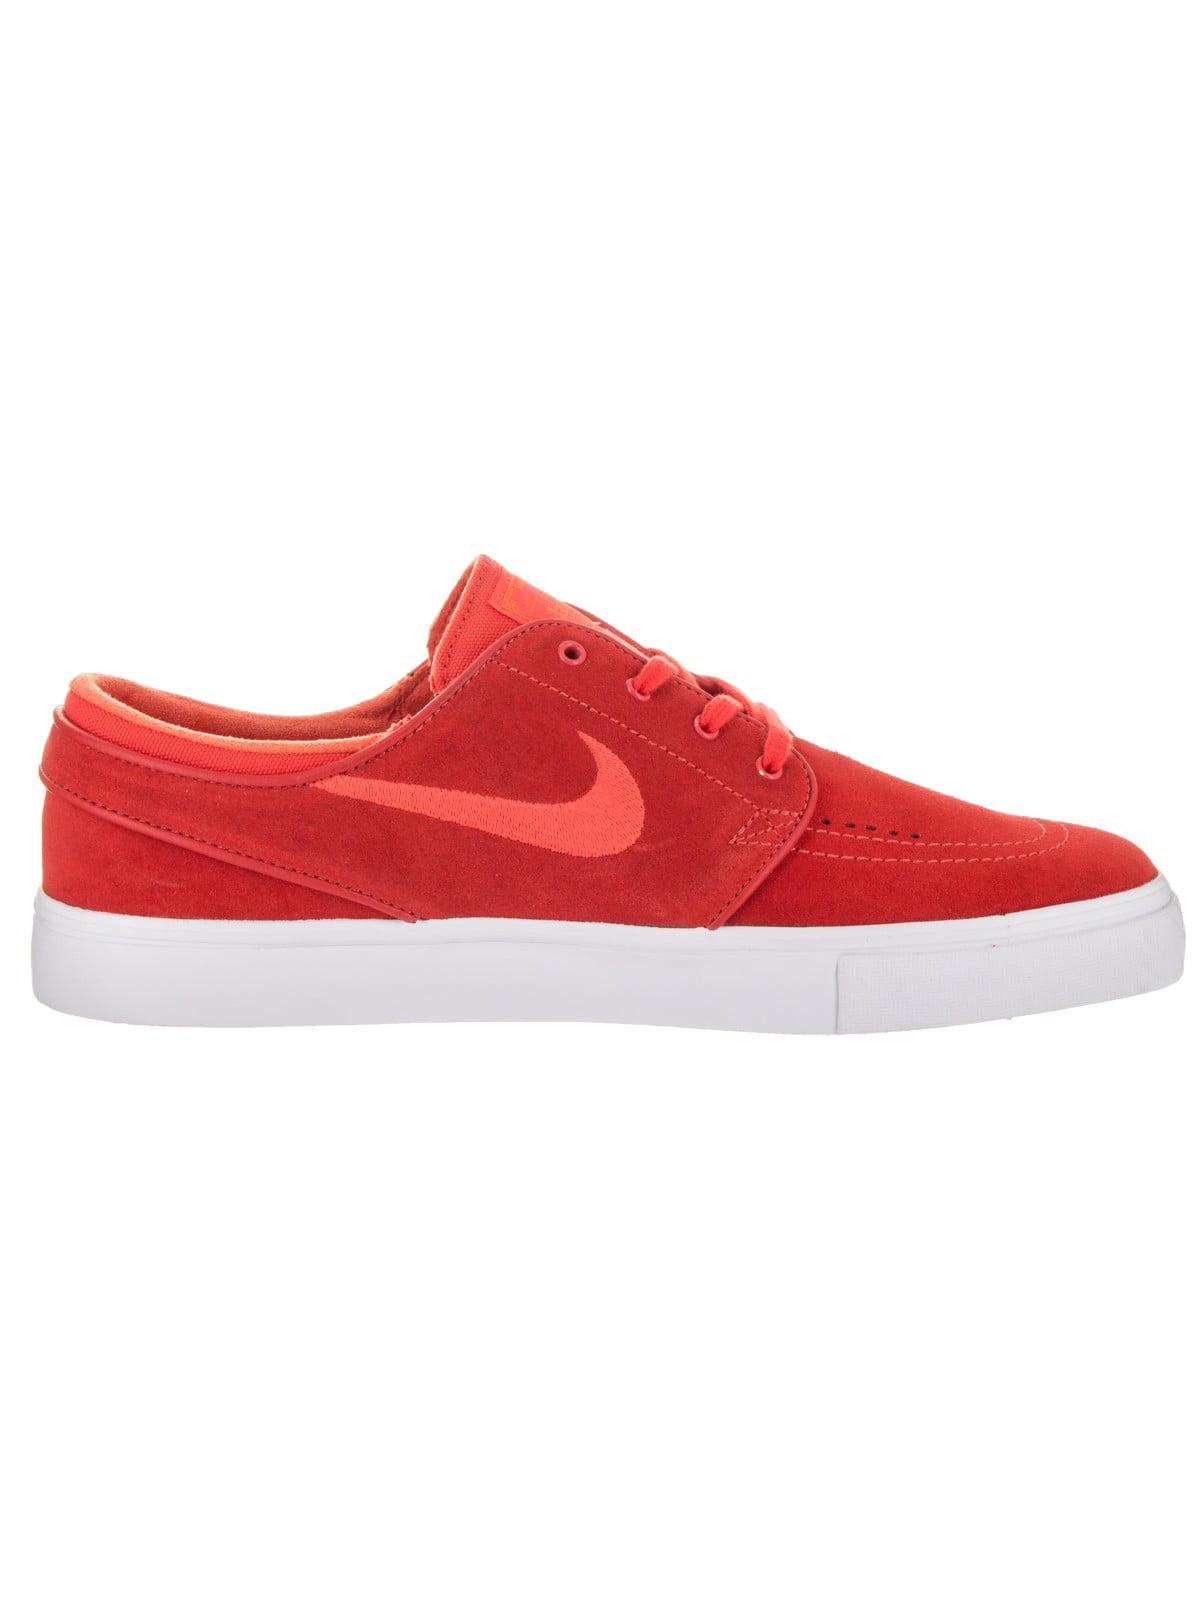 Nike Unisex SB Zoom Janoski CPSL Skate Shoe